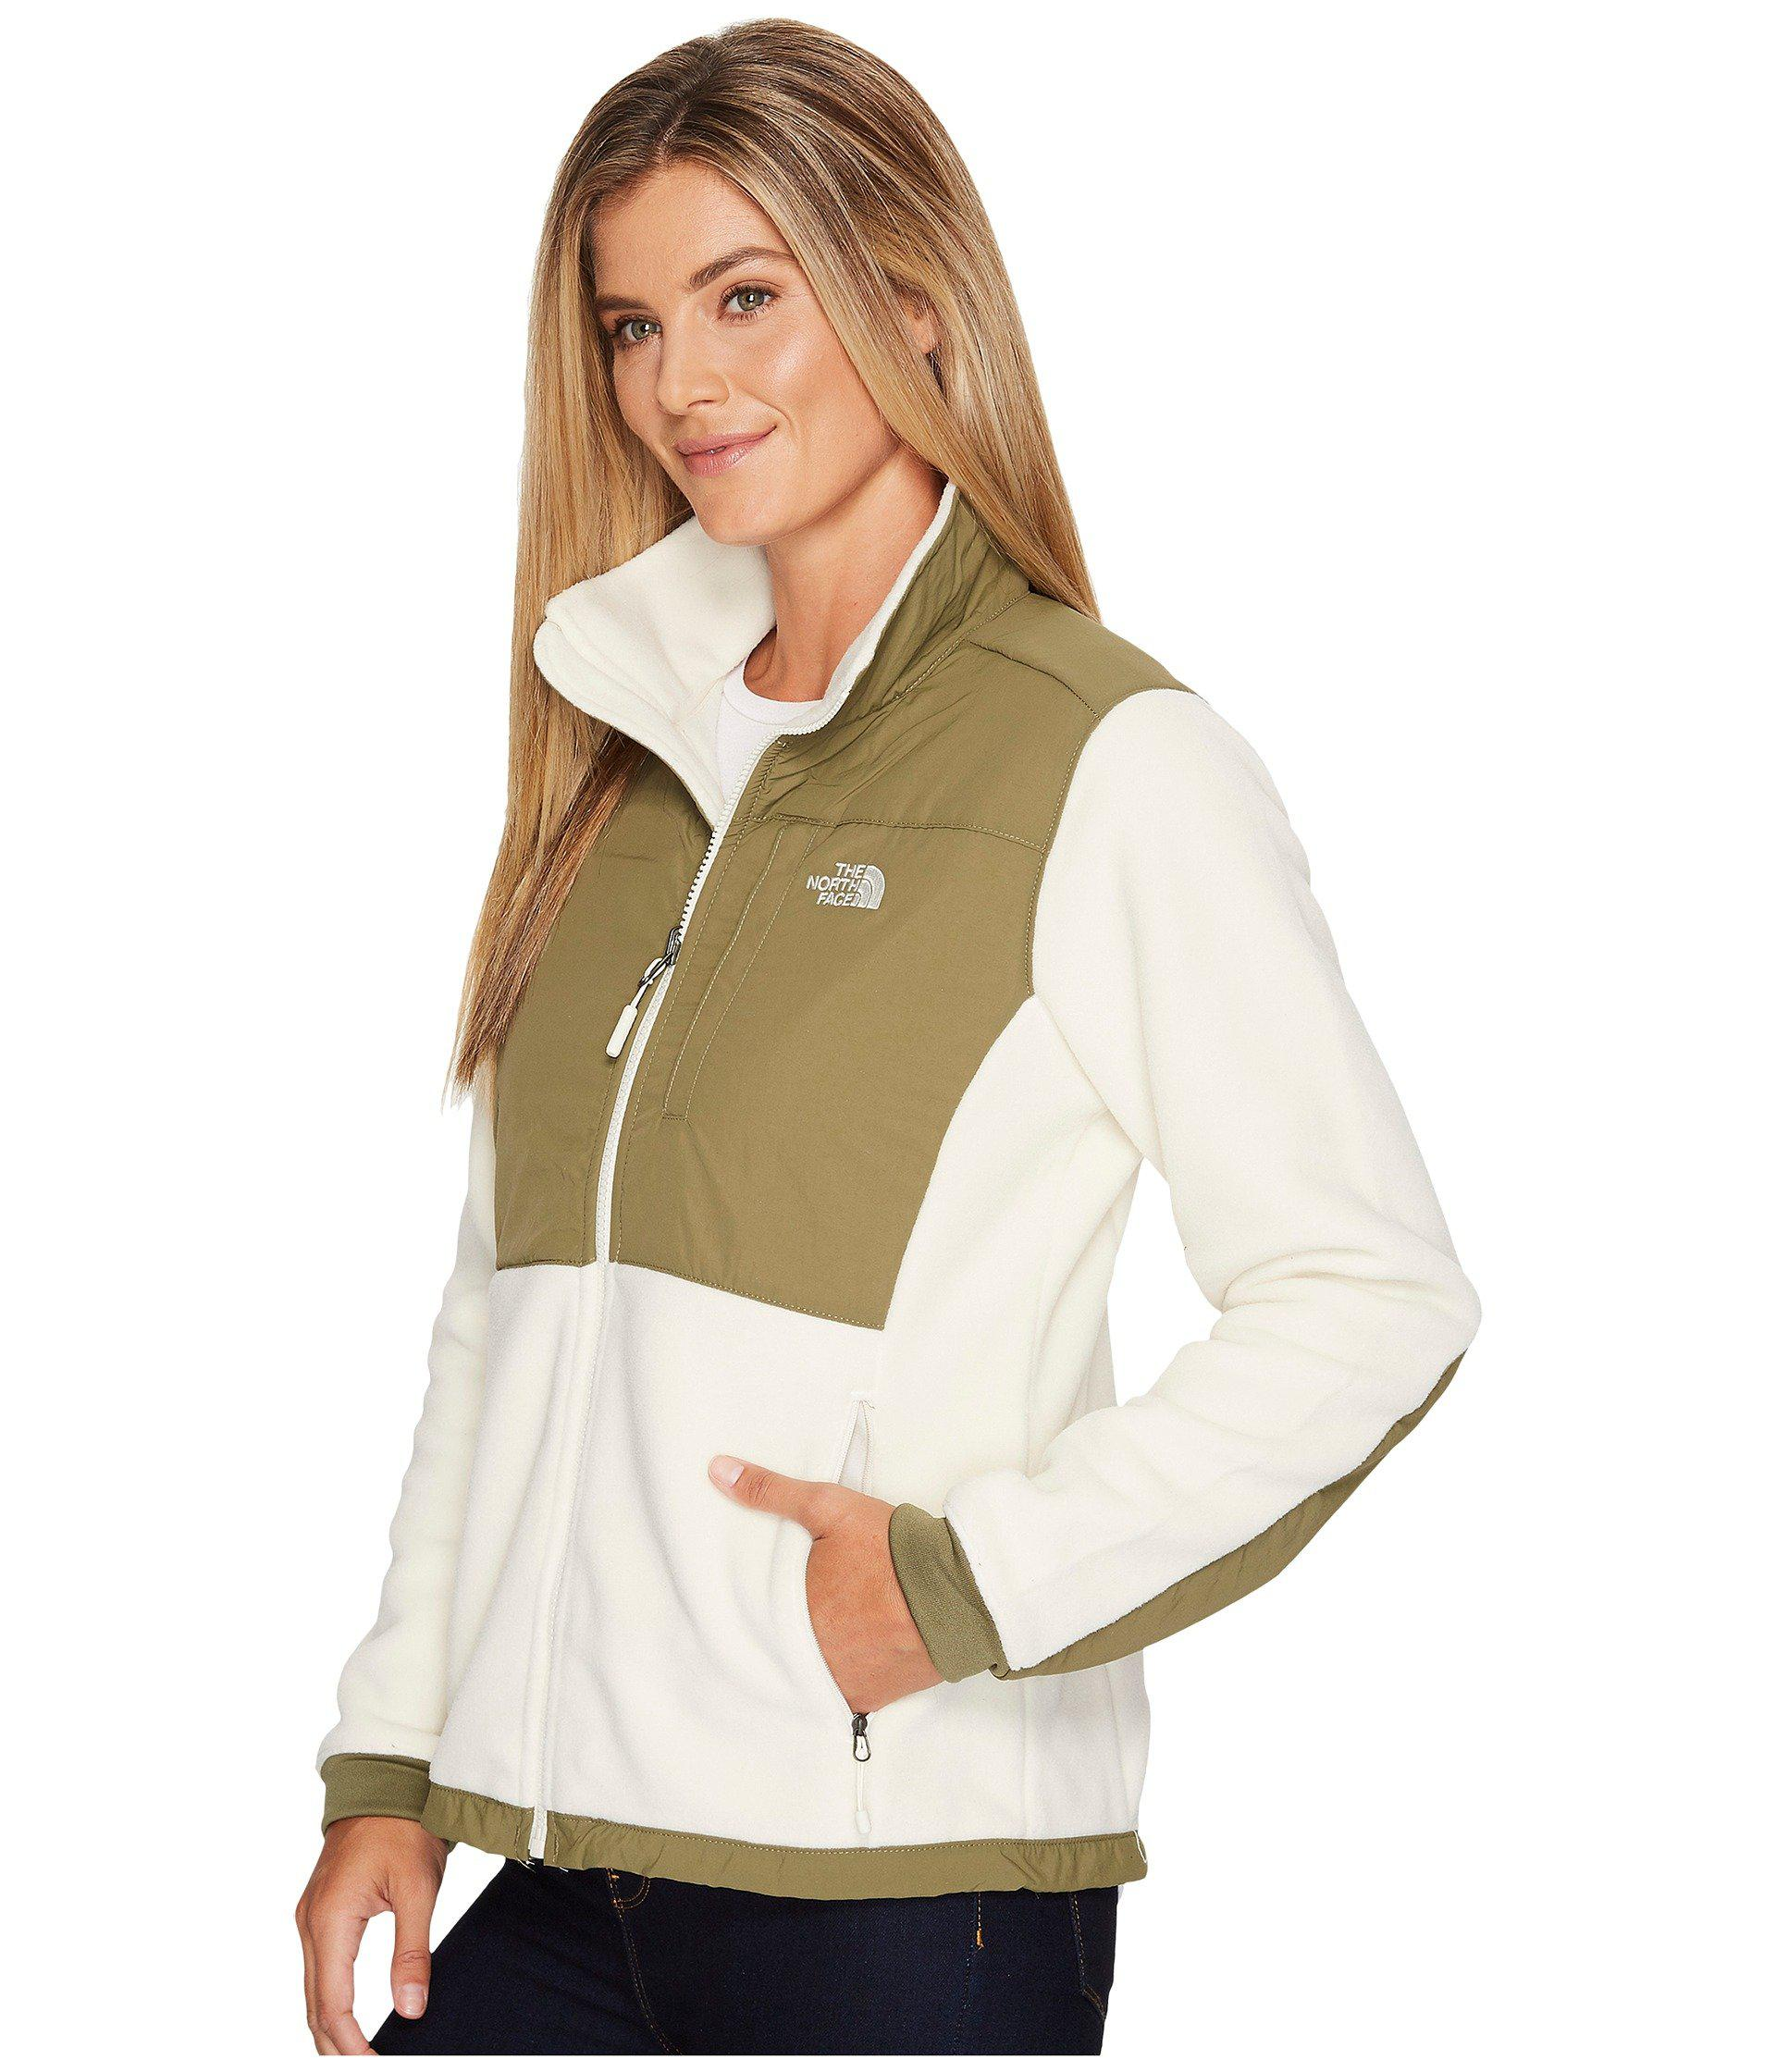 e0219982d71a The North Face - Denali 2 Jacket (vintage White burnt Olive Green) Women s.  View fullscreen